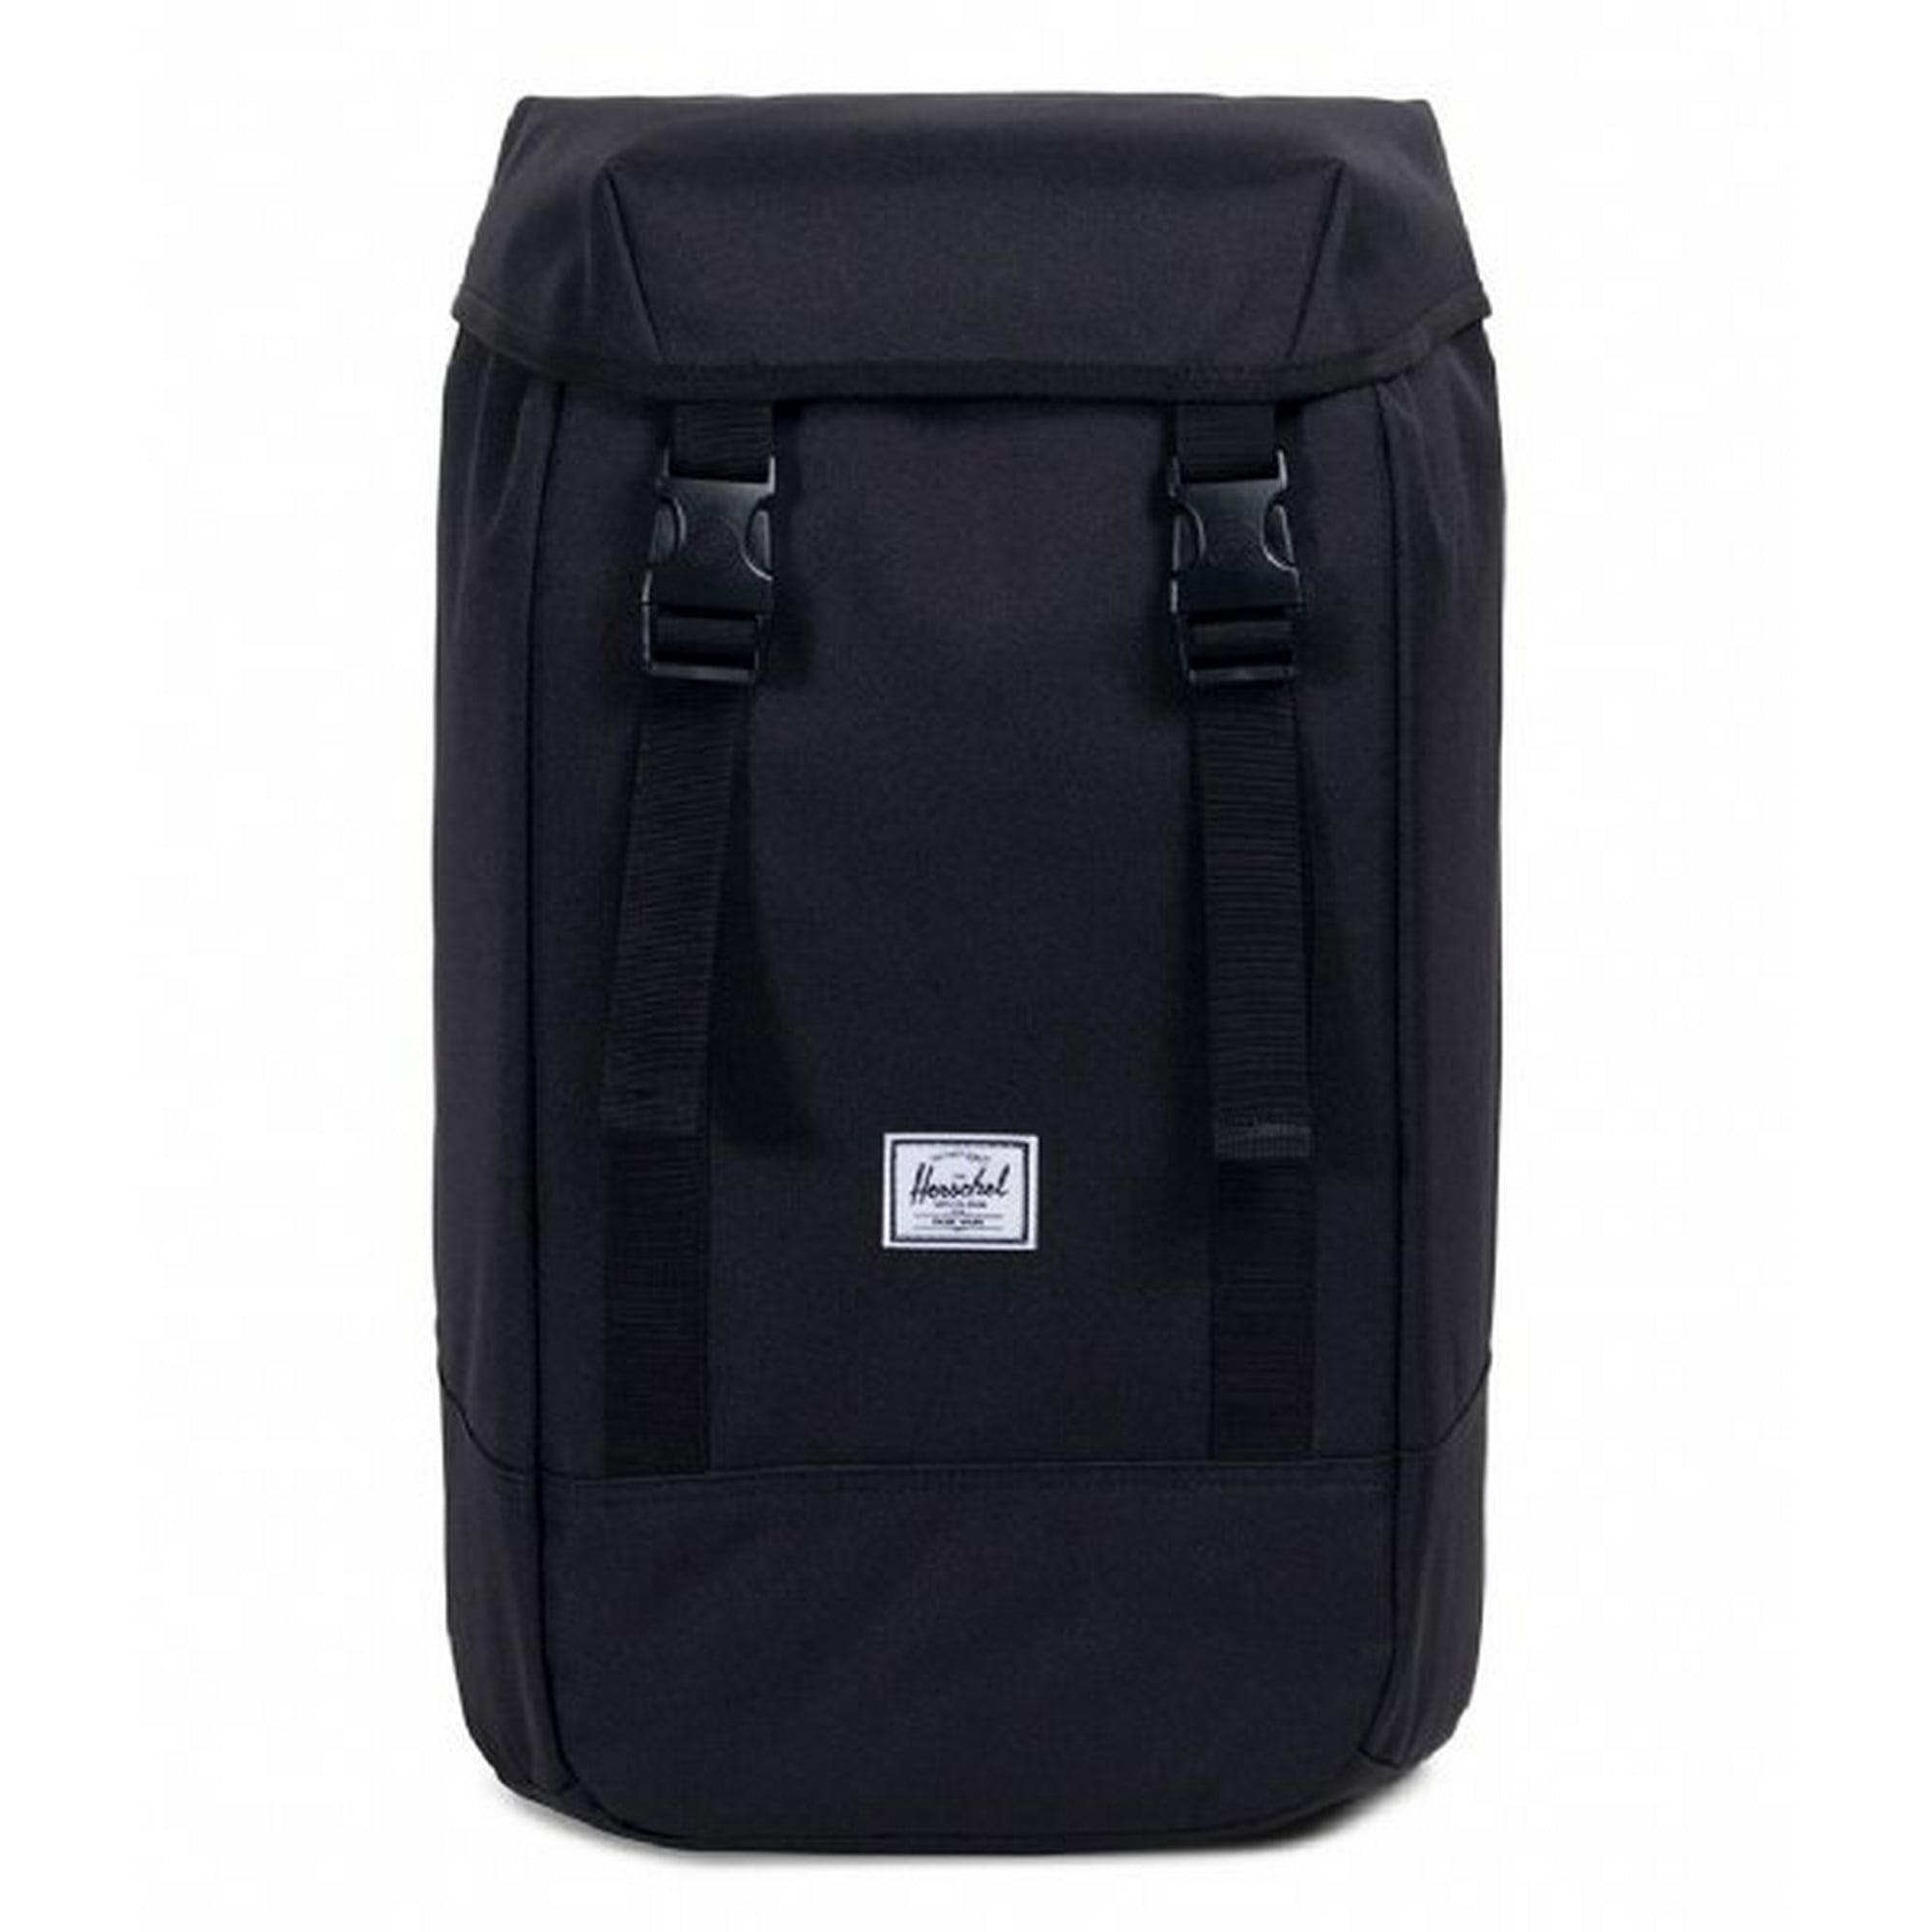 1947cbdfc45 Buy Herschel Supply Co. 10310-00001  Black Iona Backpack